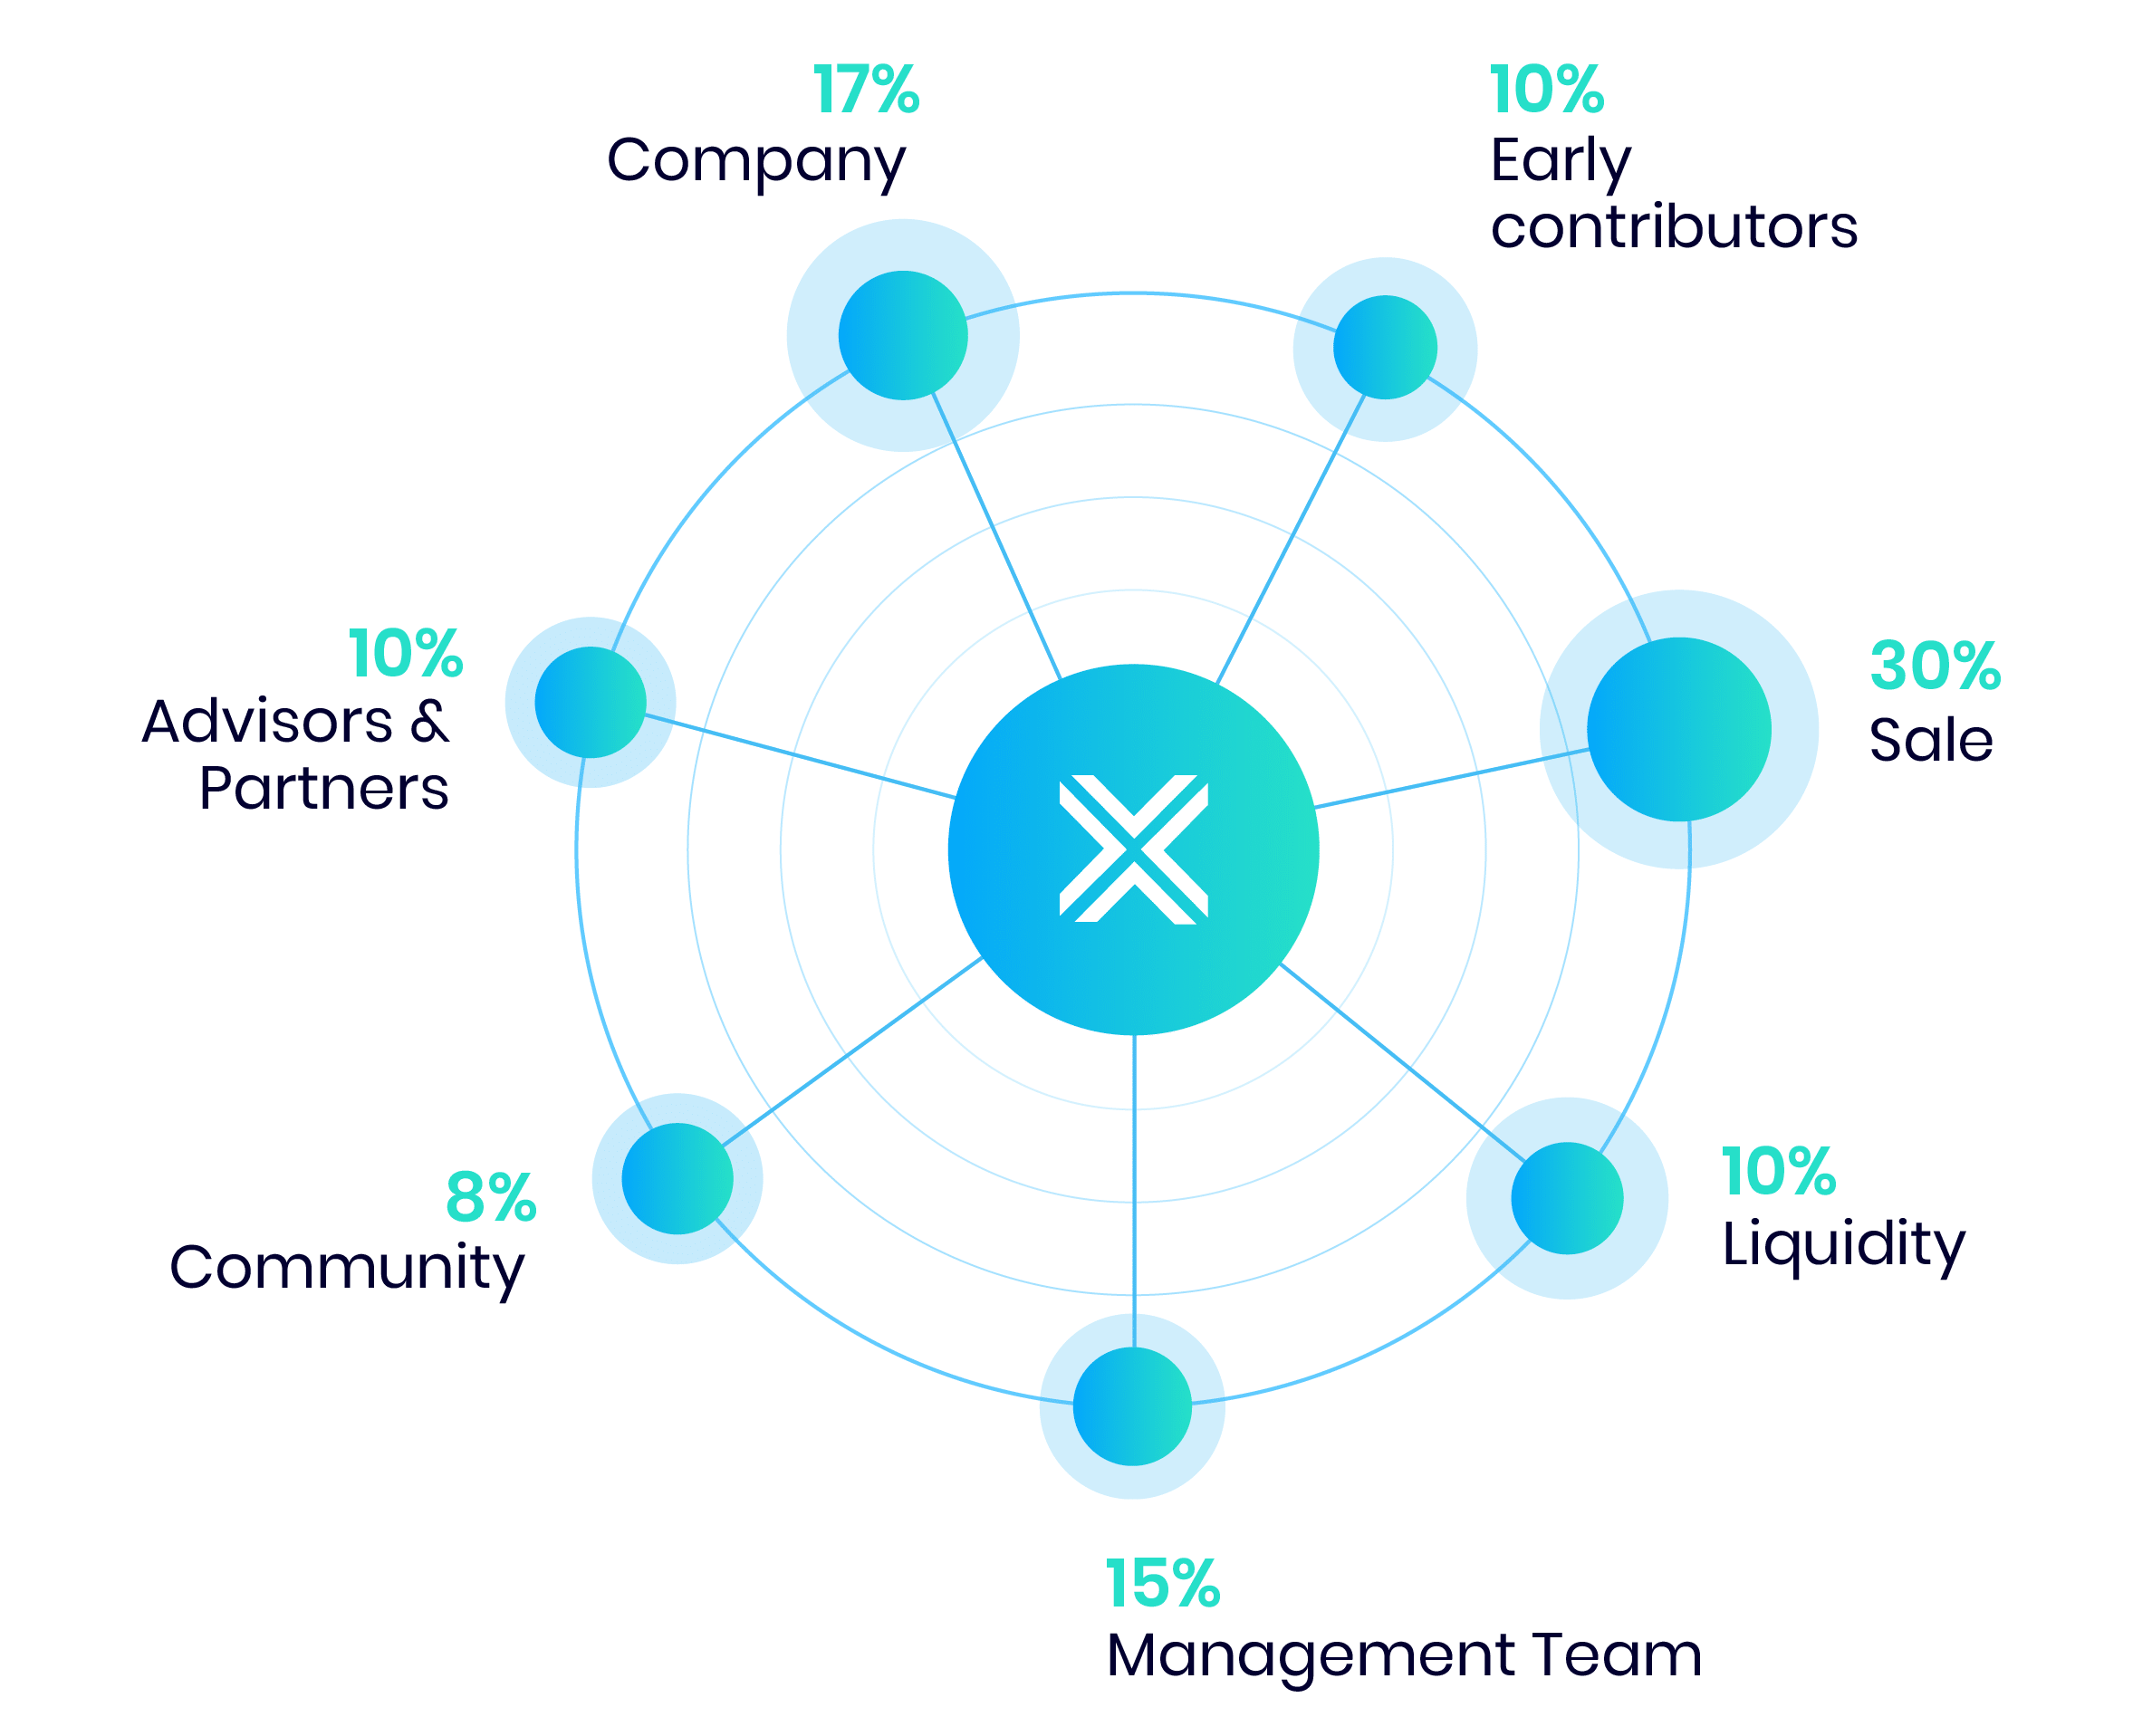 Nowy token od IronFX